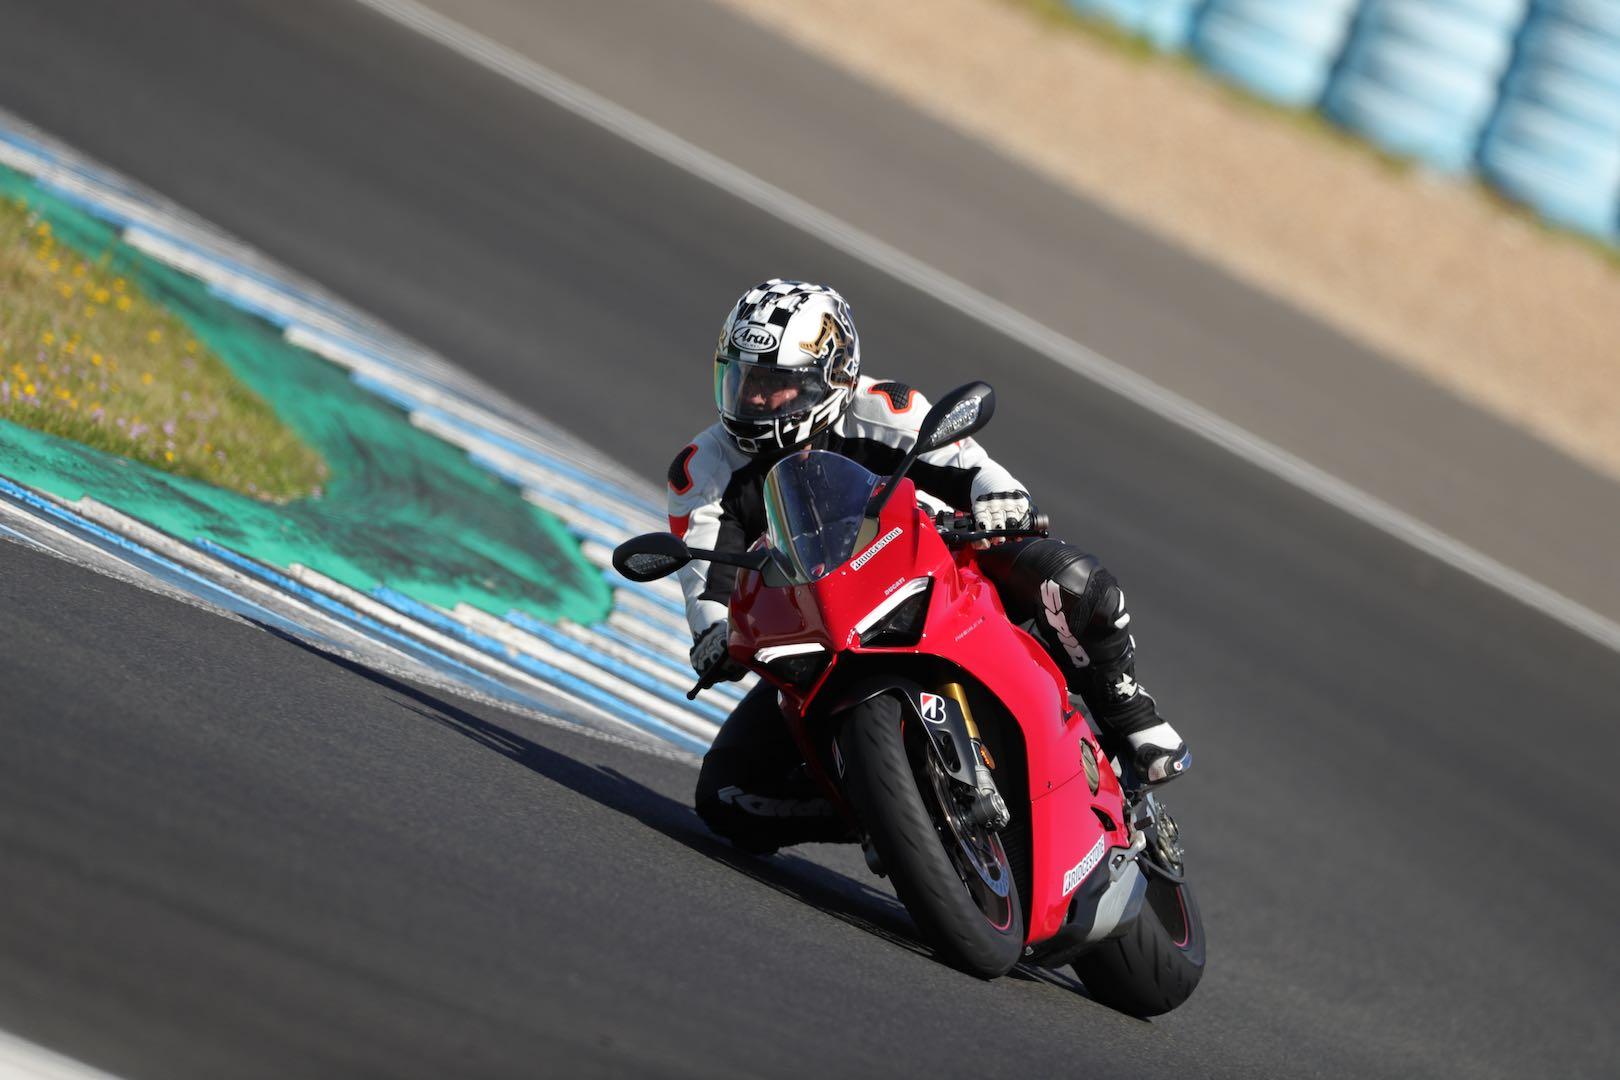 Ducati V4 Superbike